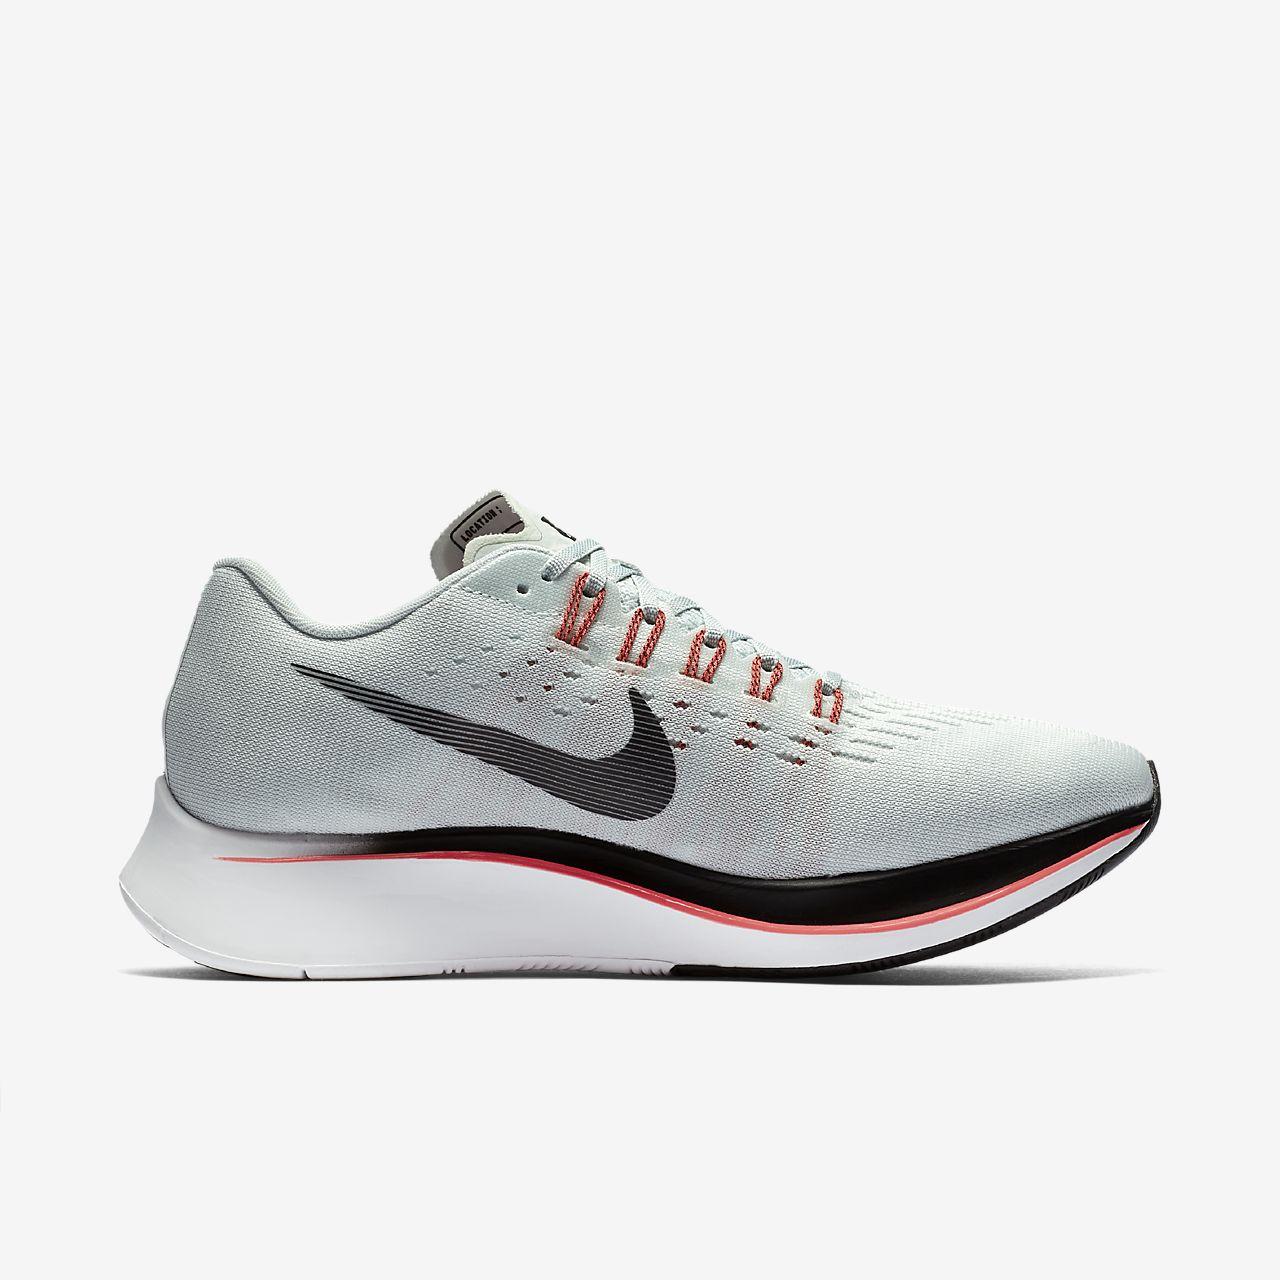 check out 94a71 d9e4e Nike Air Max 90 Black Red